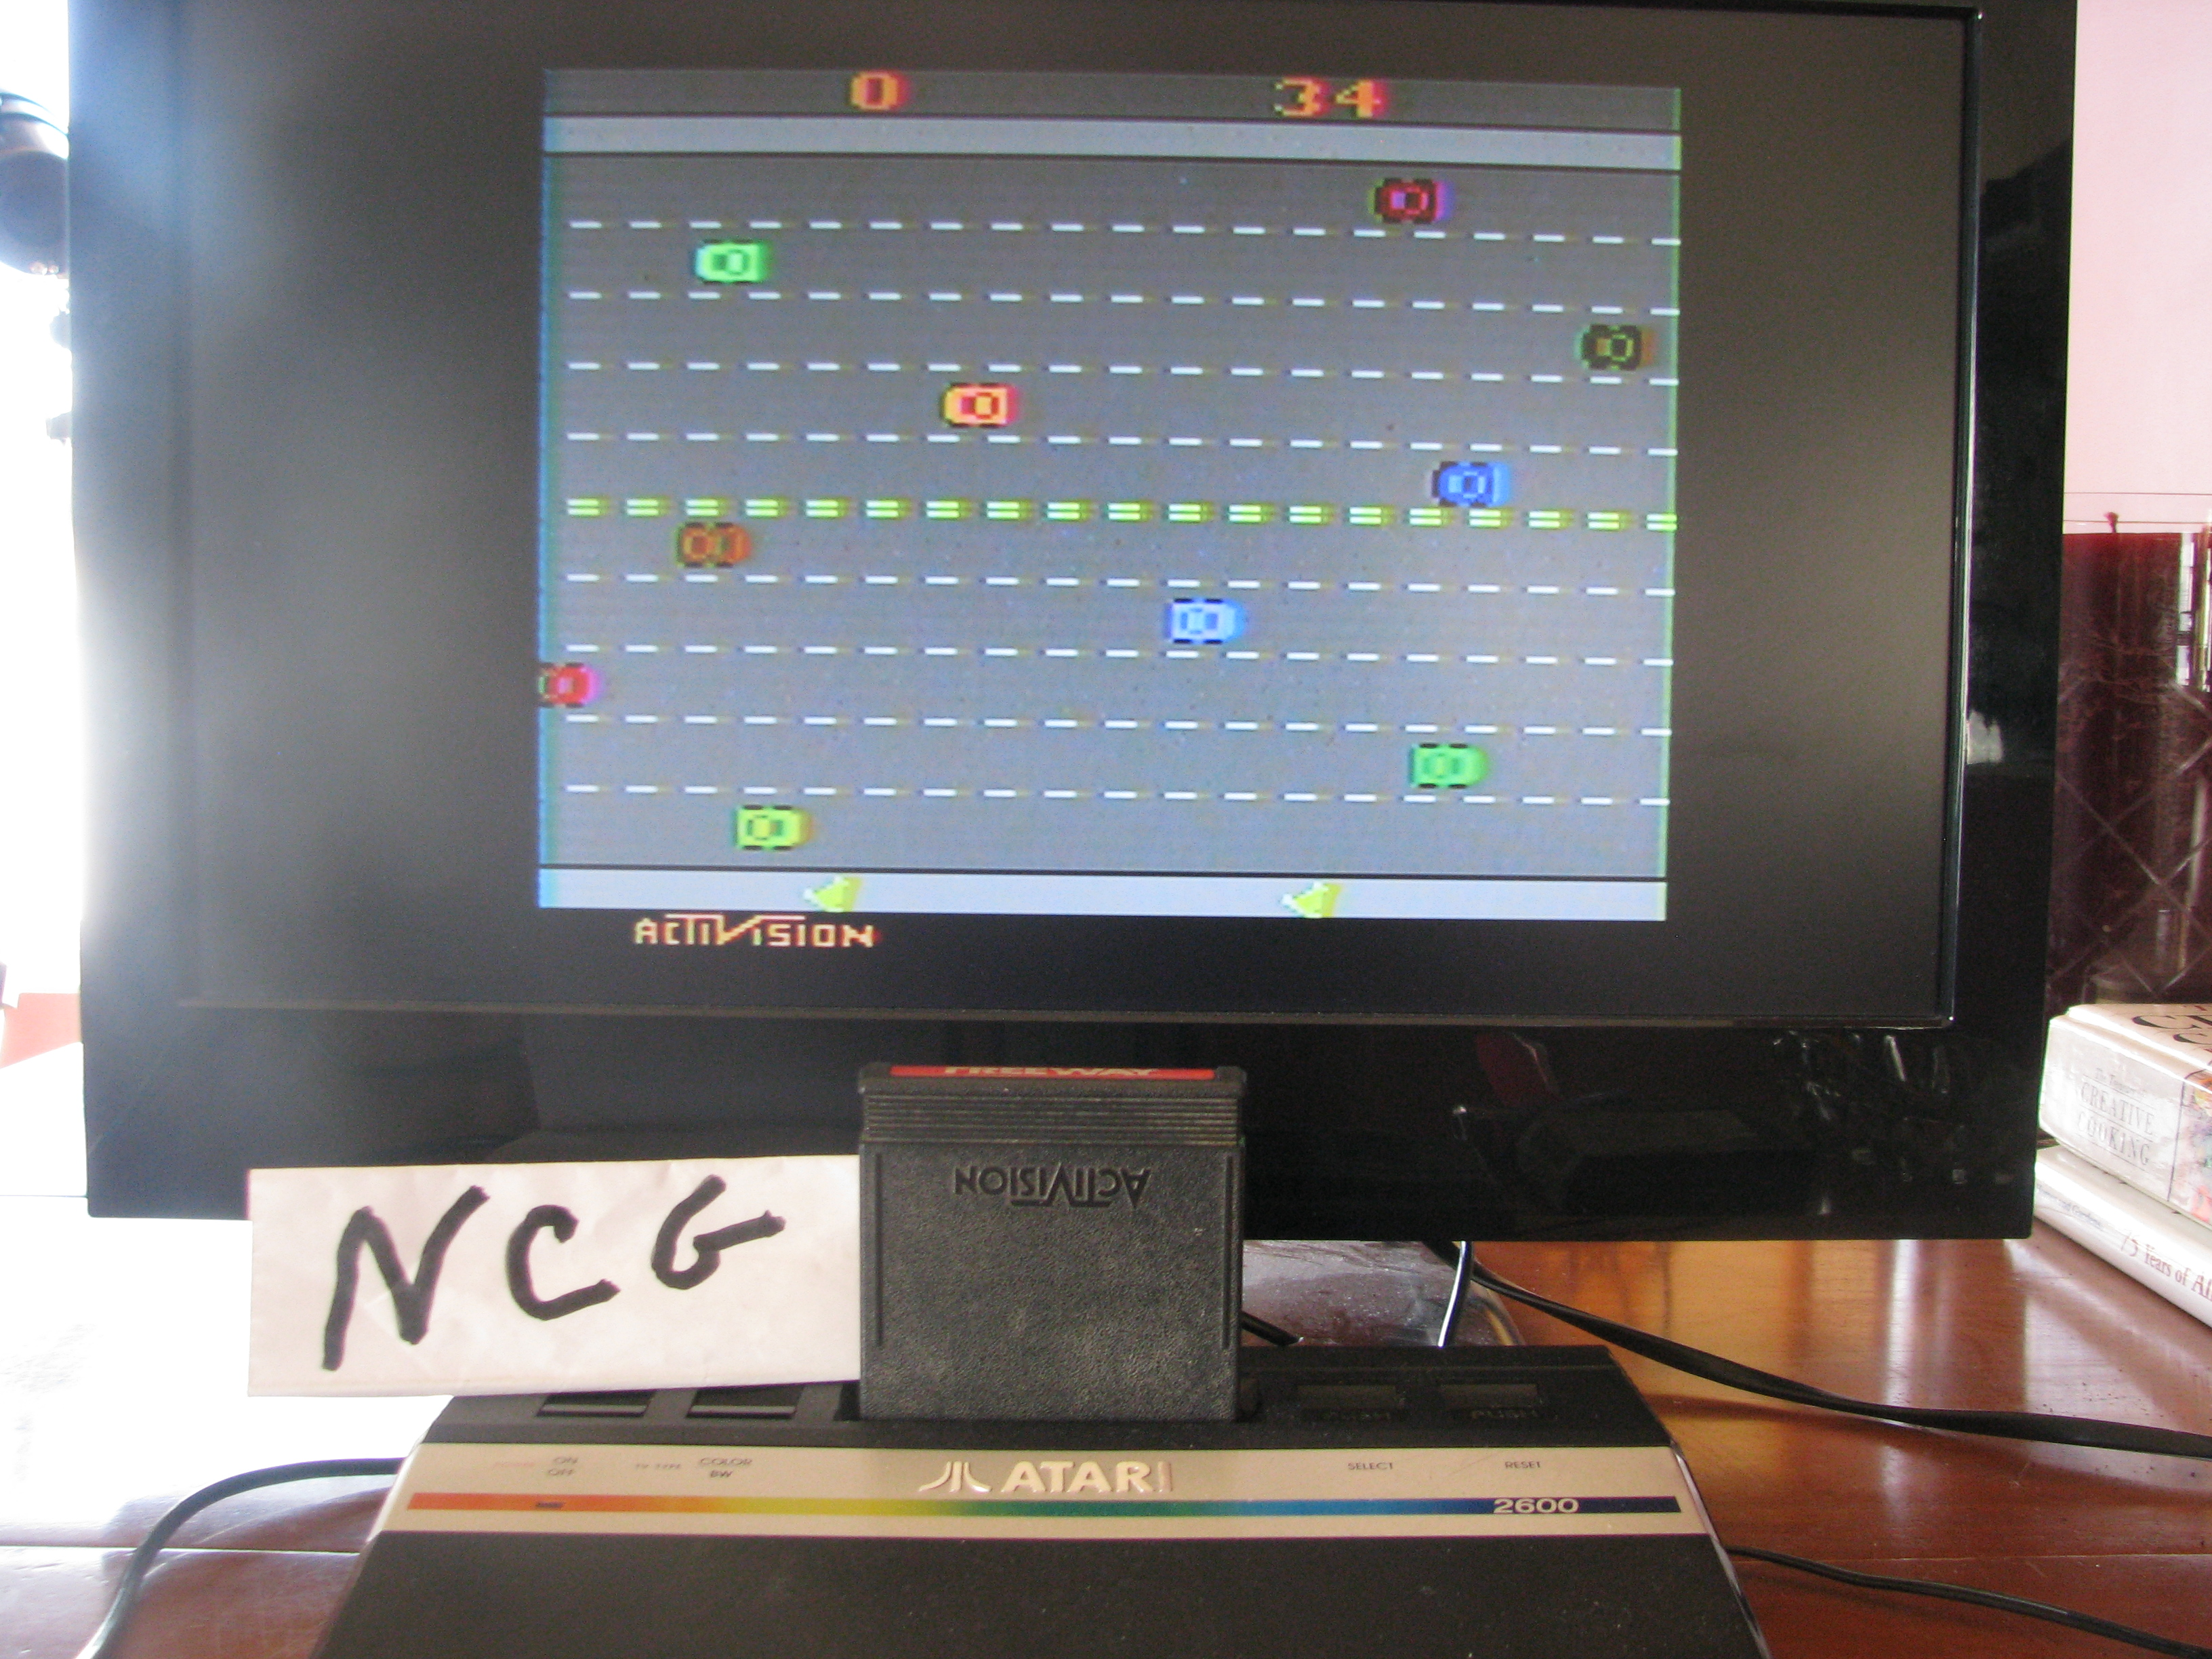 NorthCoastGamer: Freeway: Game 1 (Atari 2600 Novice/B) 34 points on 2015-02-20 15:33:21